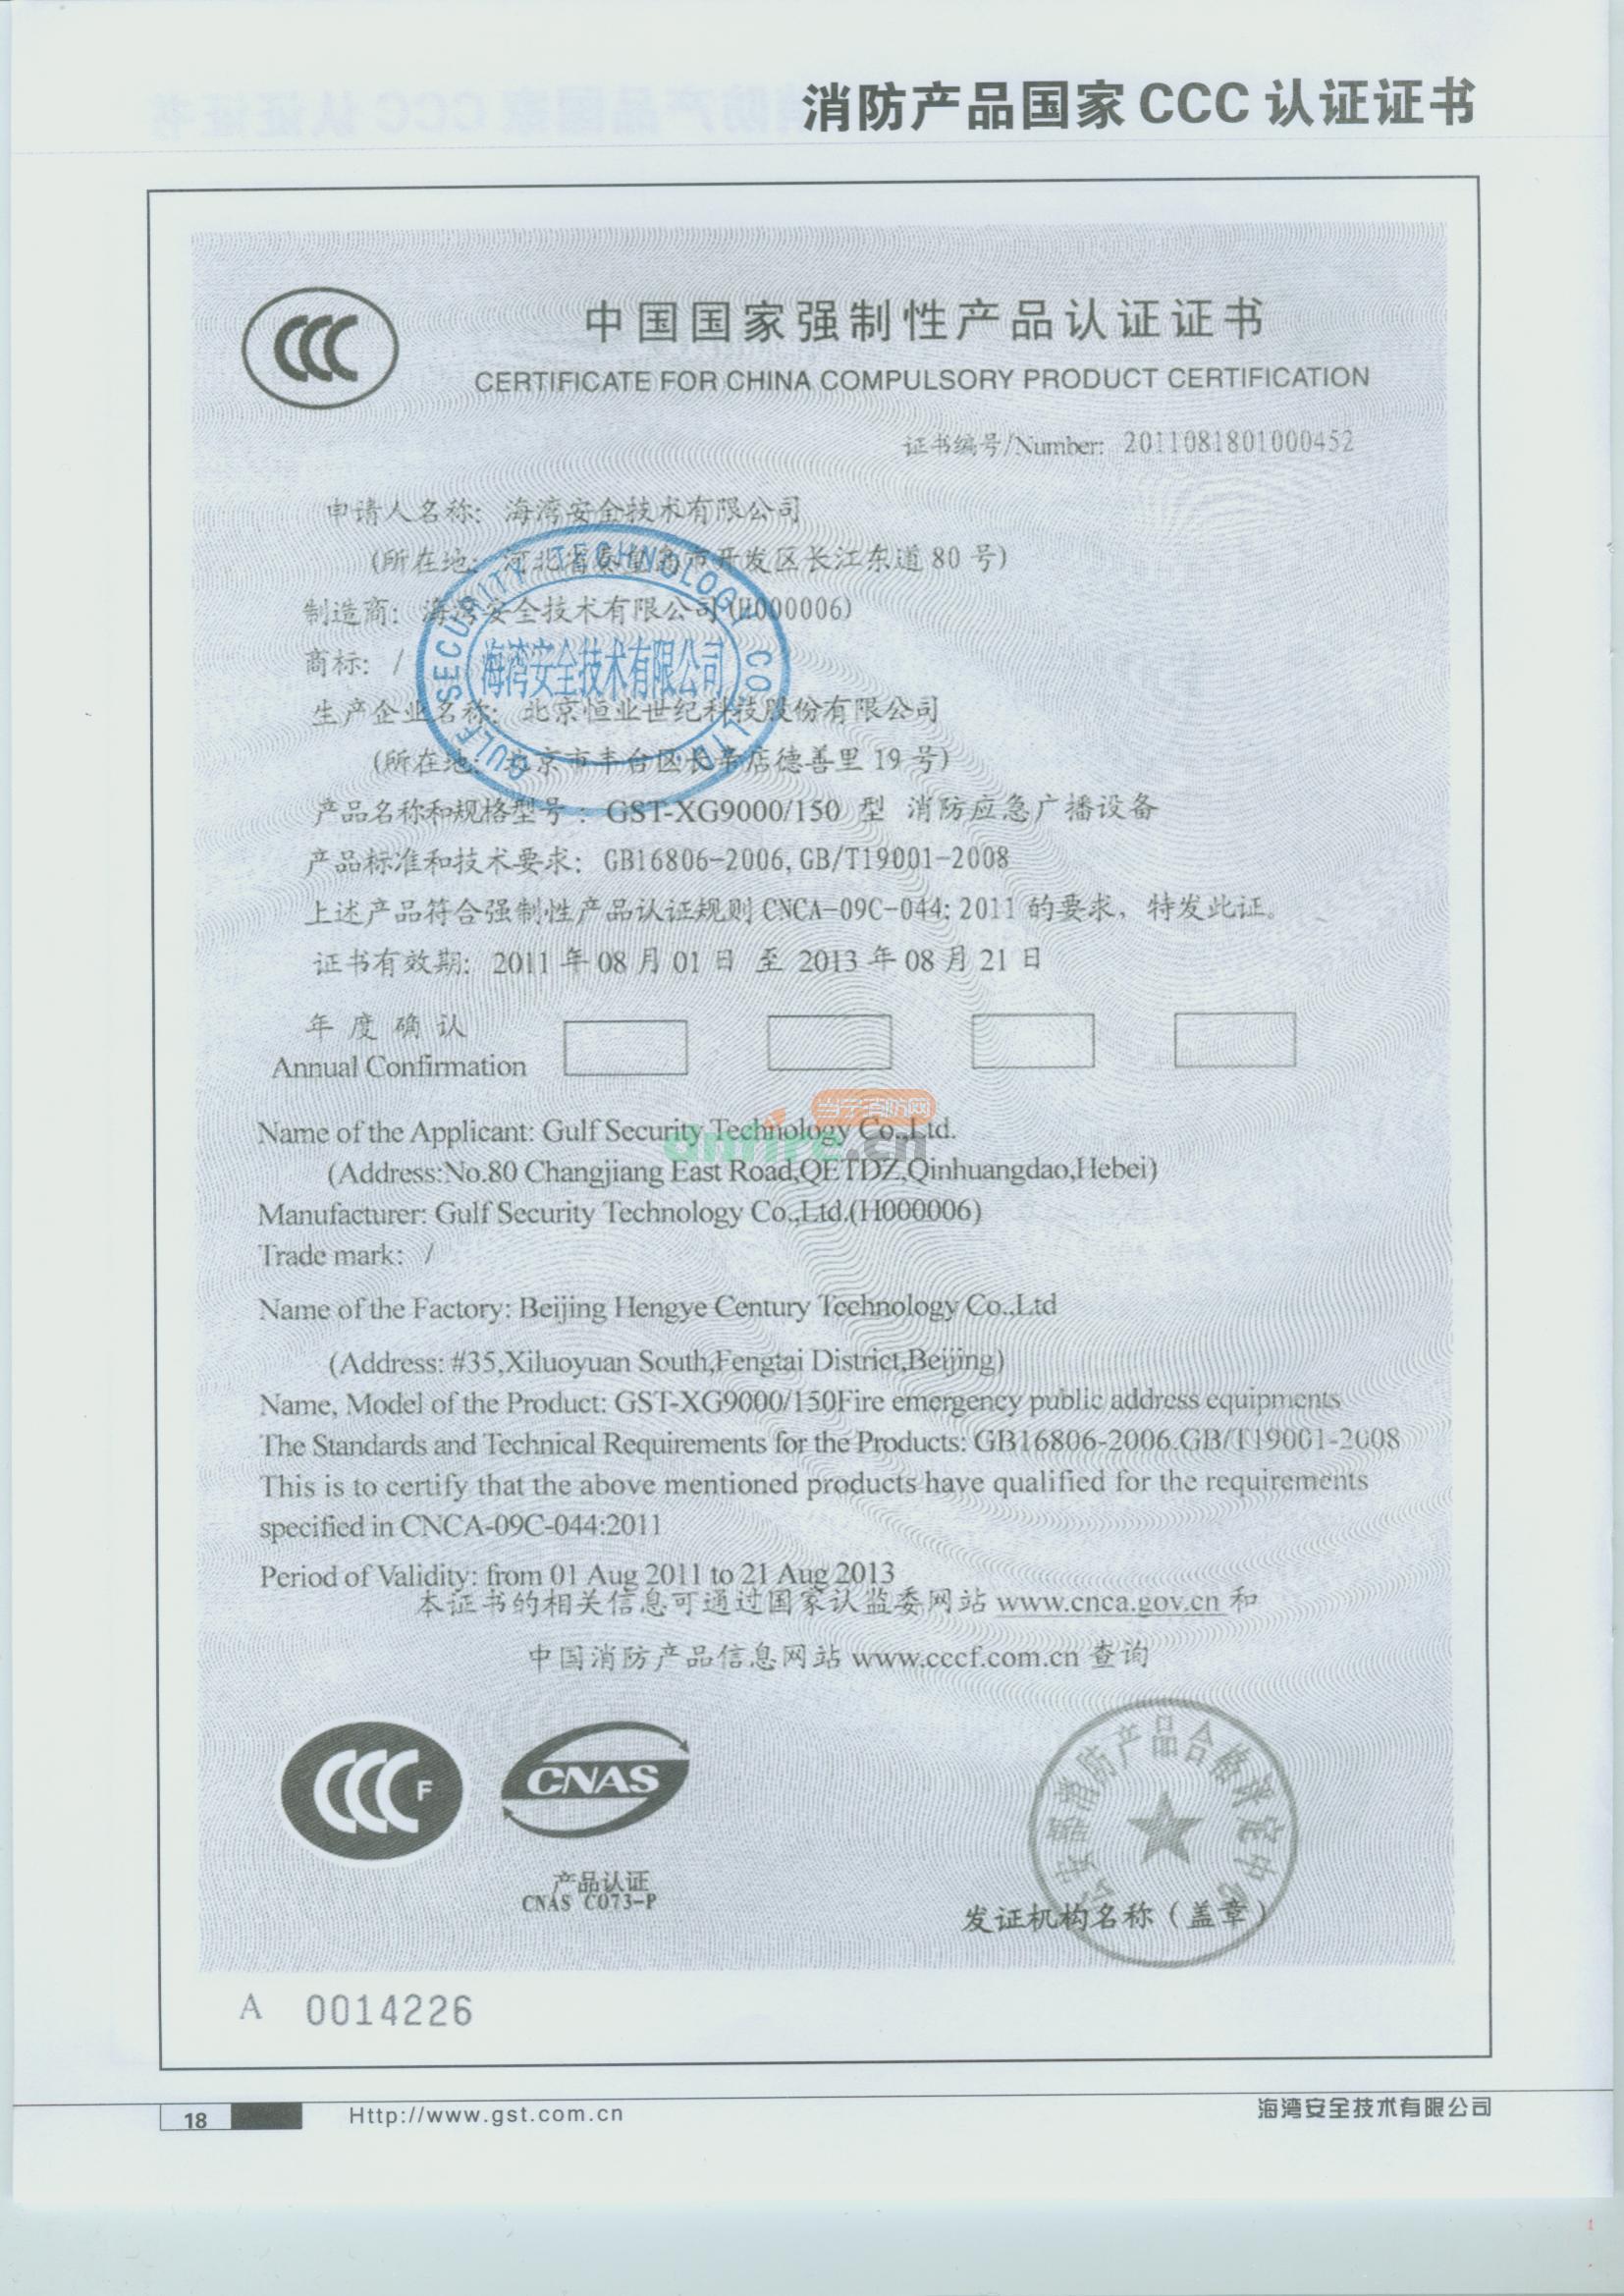 gst-xg9000a/150型消防应急广播设备3c认证证书_当宁.